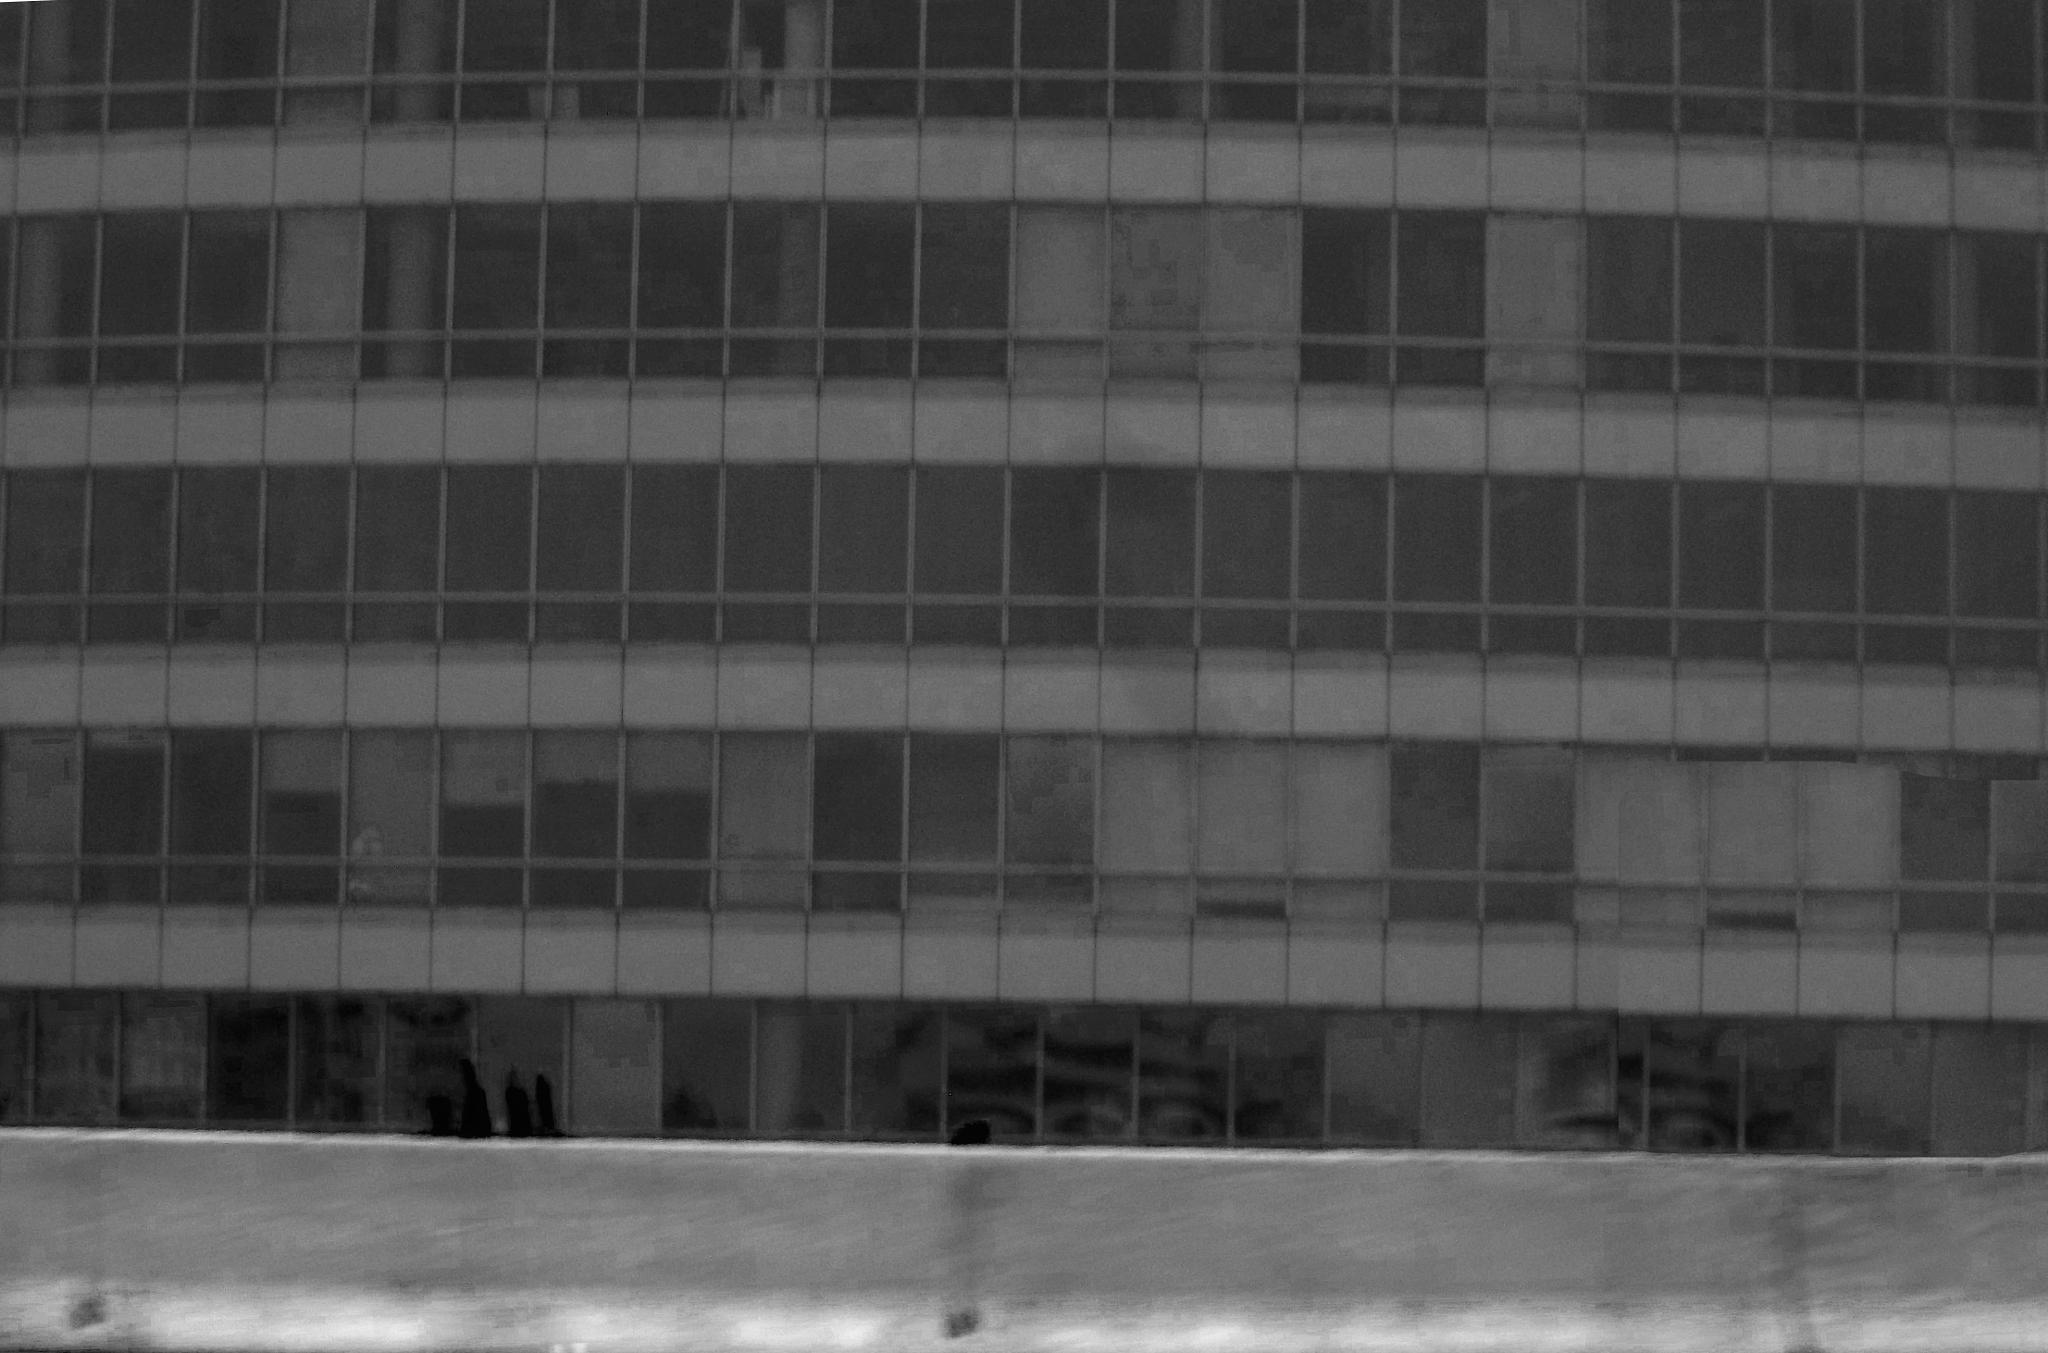 Windows  by evelyn.vinson